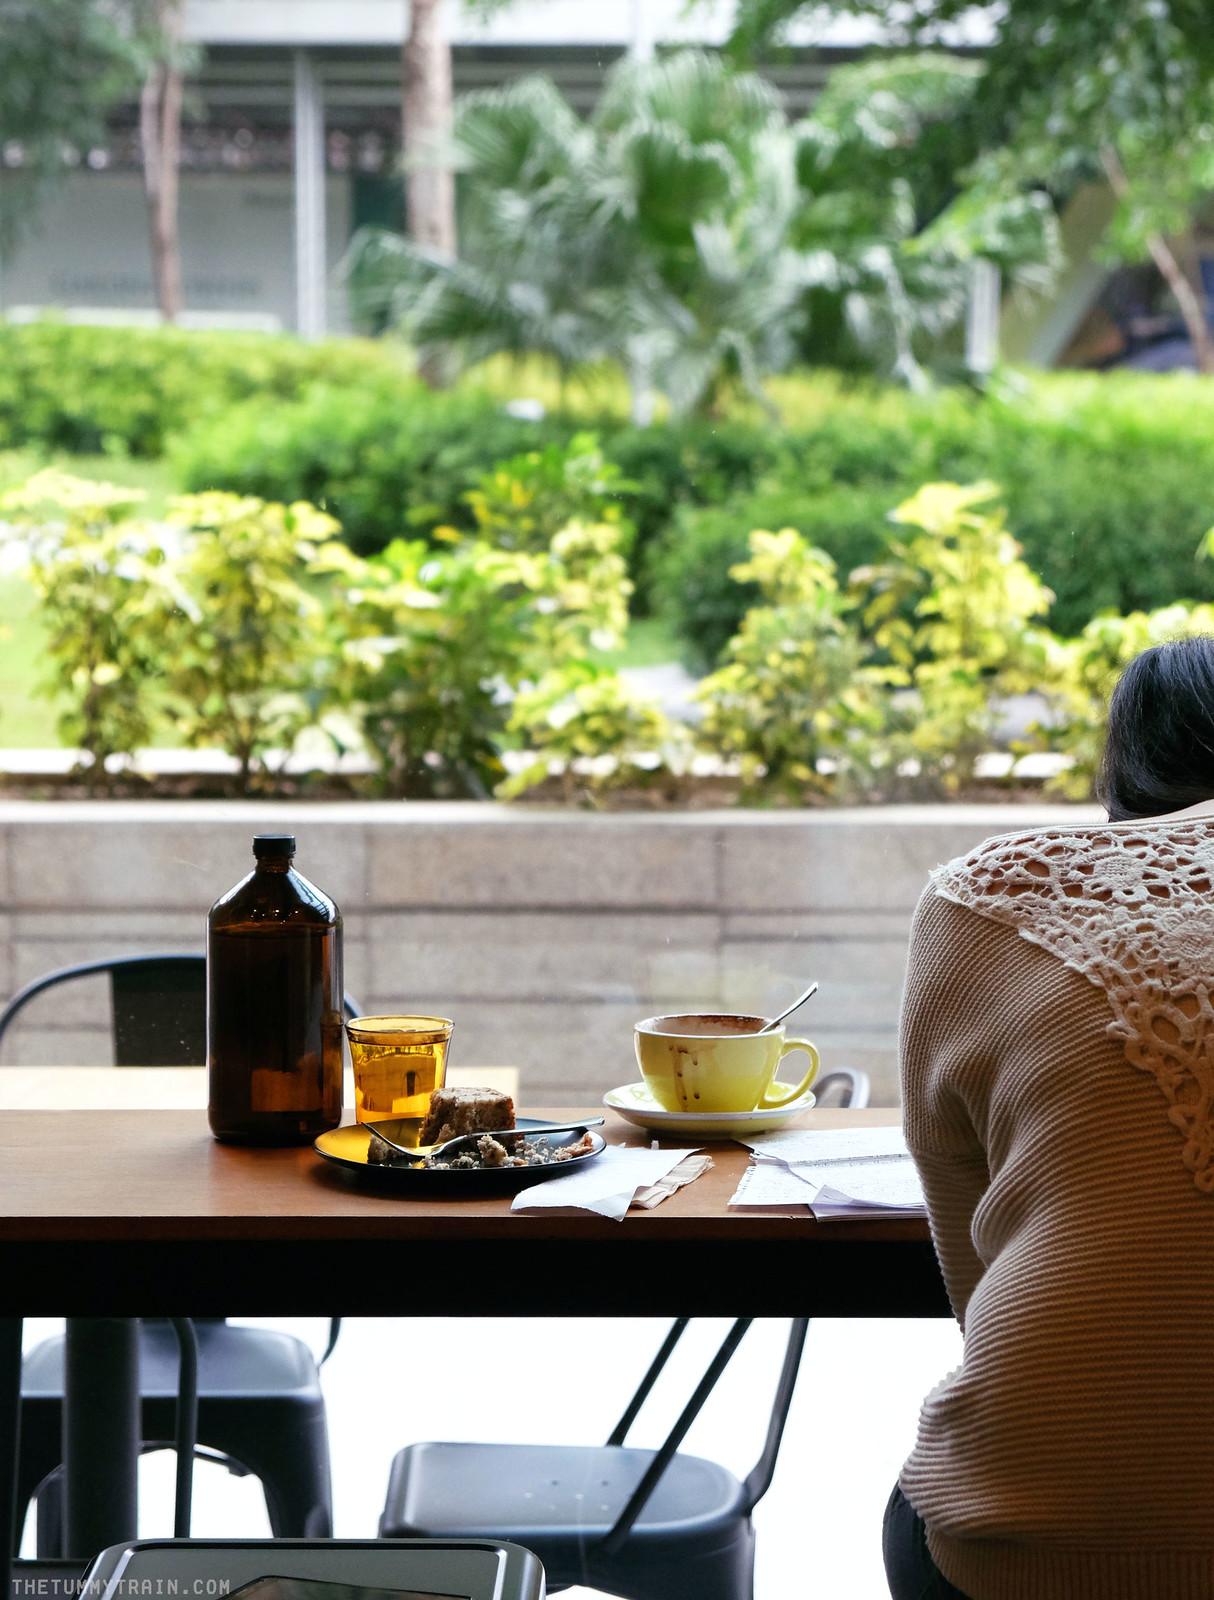 30304477943 fc2ed5b2dc h - A Fundamental Coffee break in Park Terraces Tower Makati